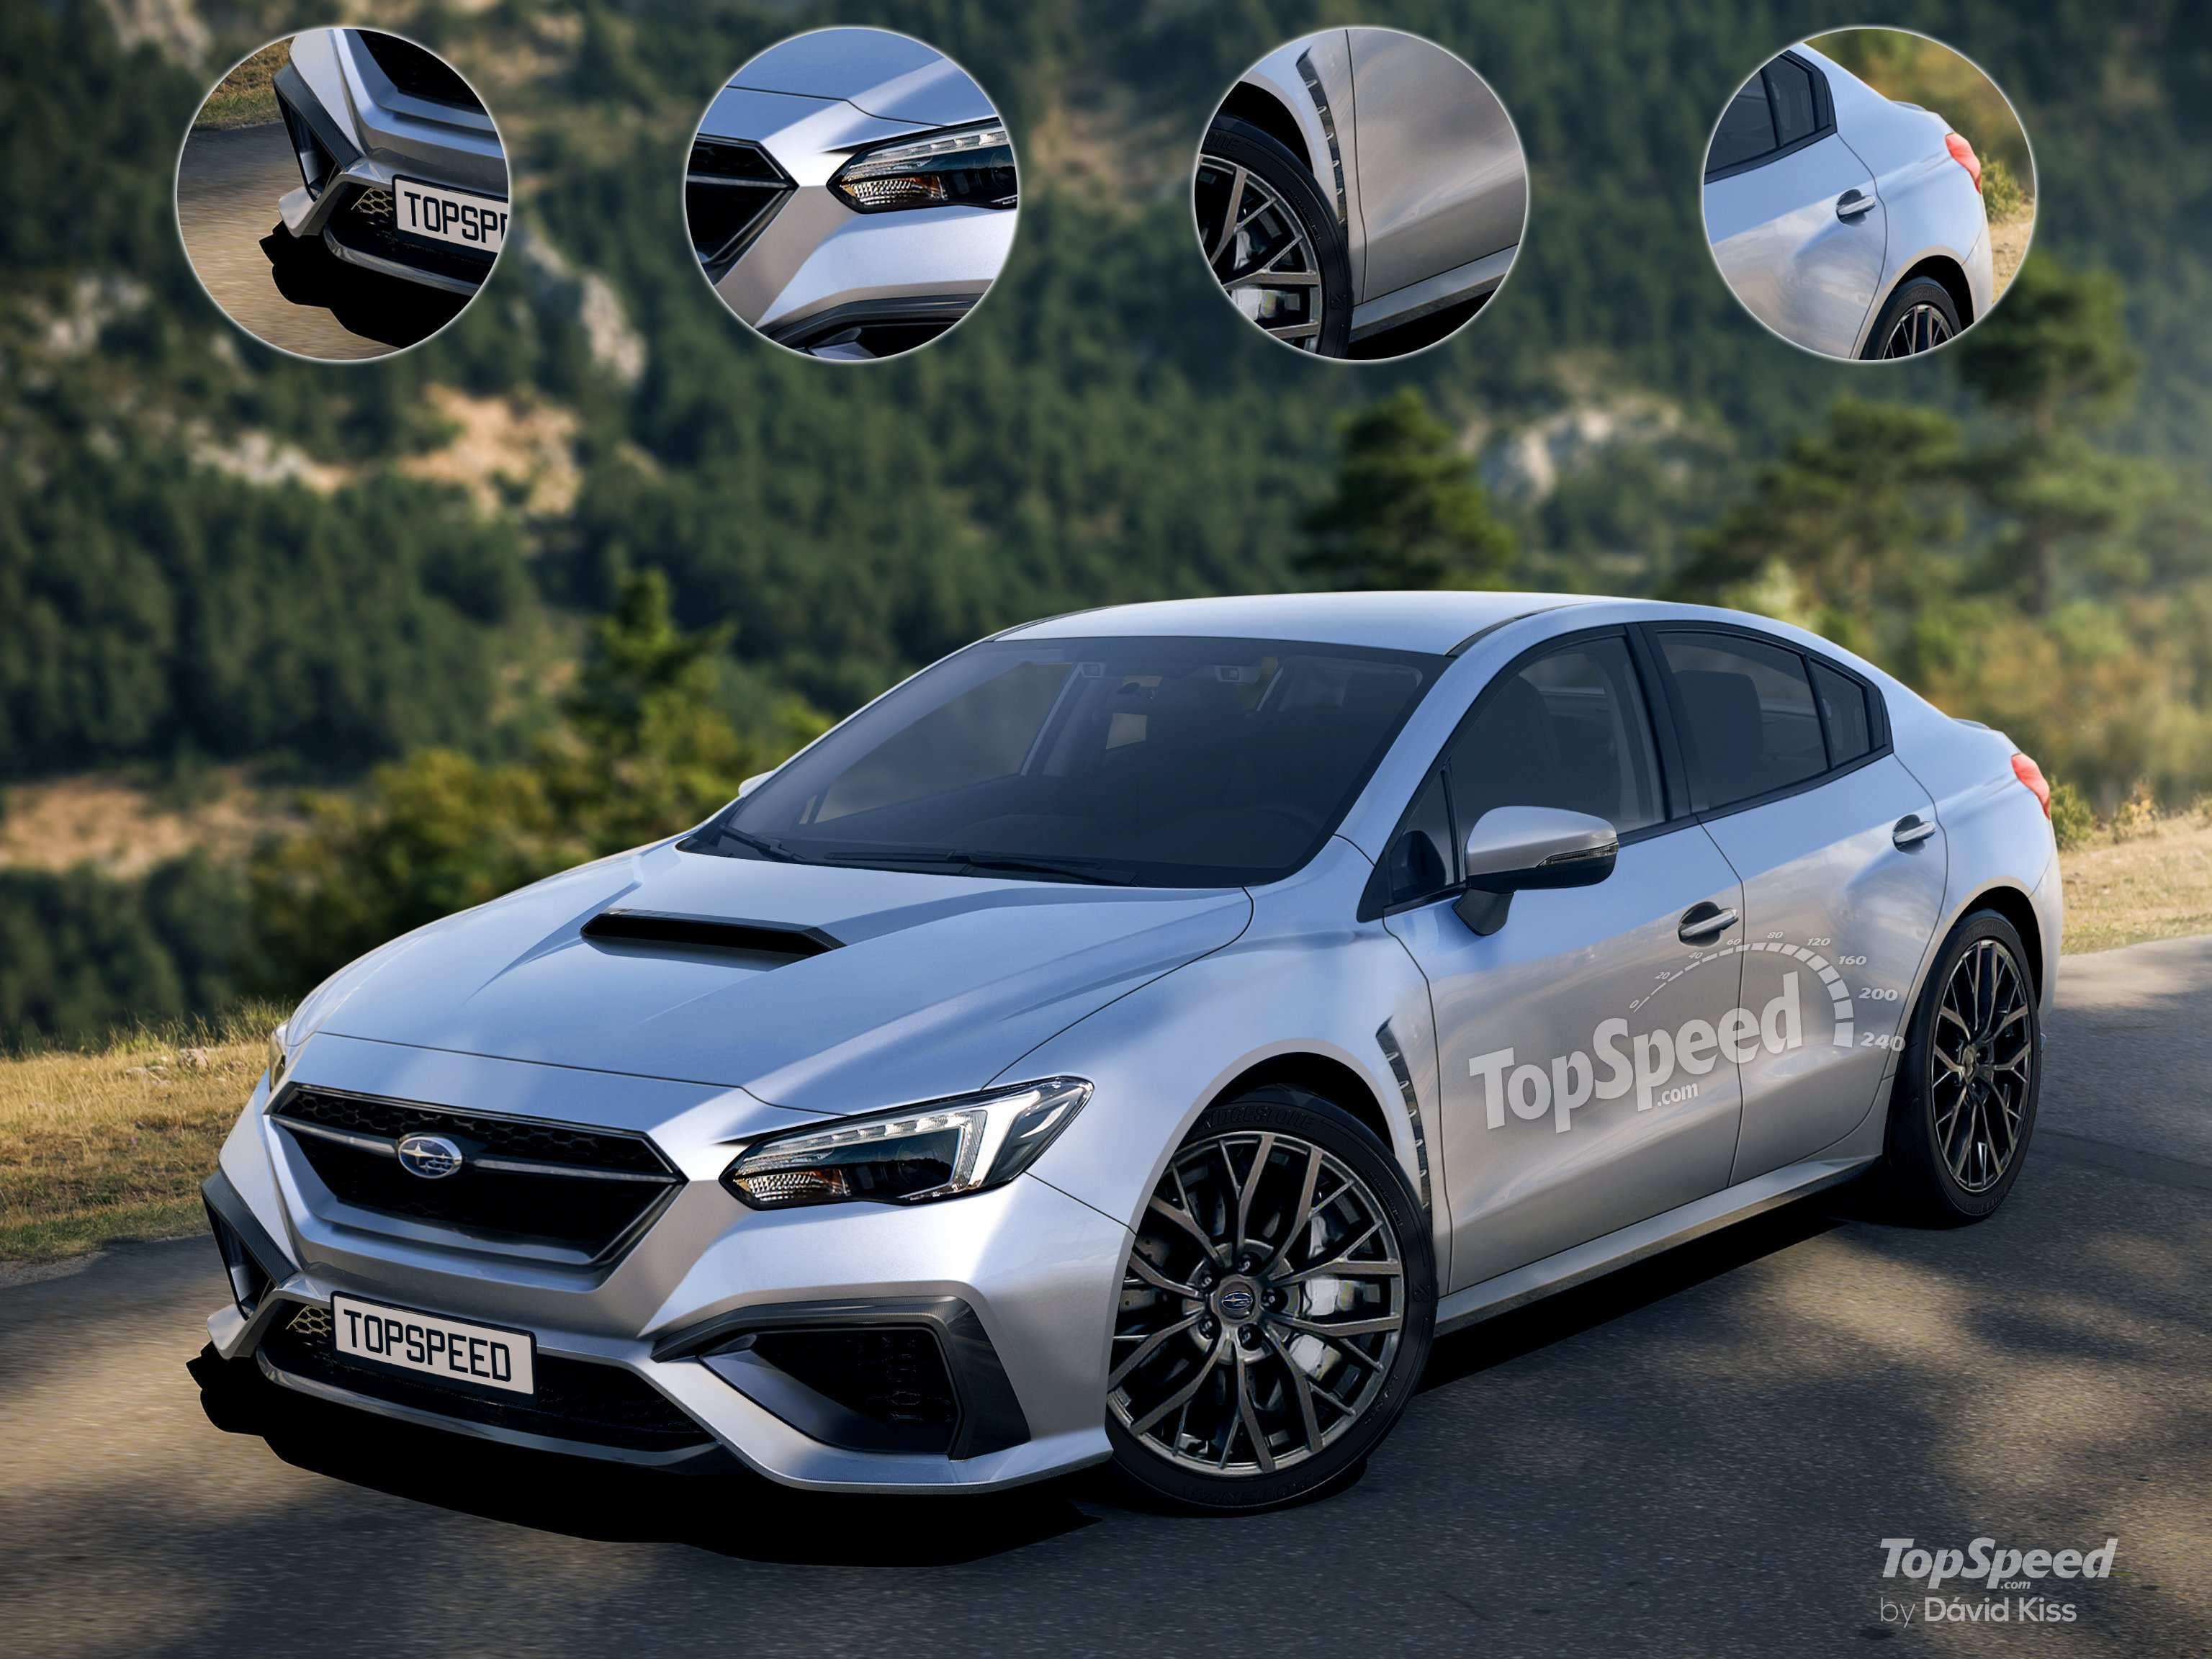 32 Best Review 2020 Subaru WRX STI Release Date for 2020 Subaru WRX STI